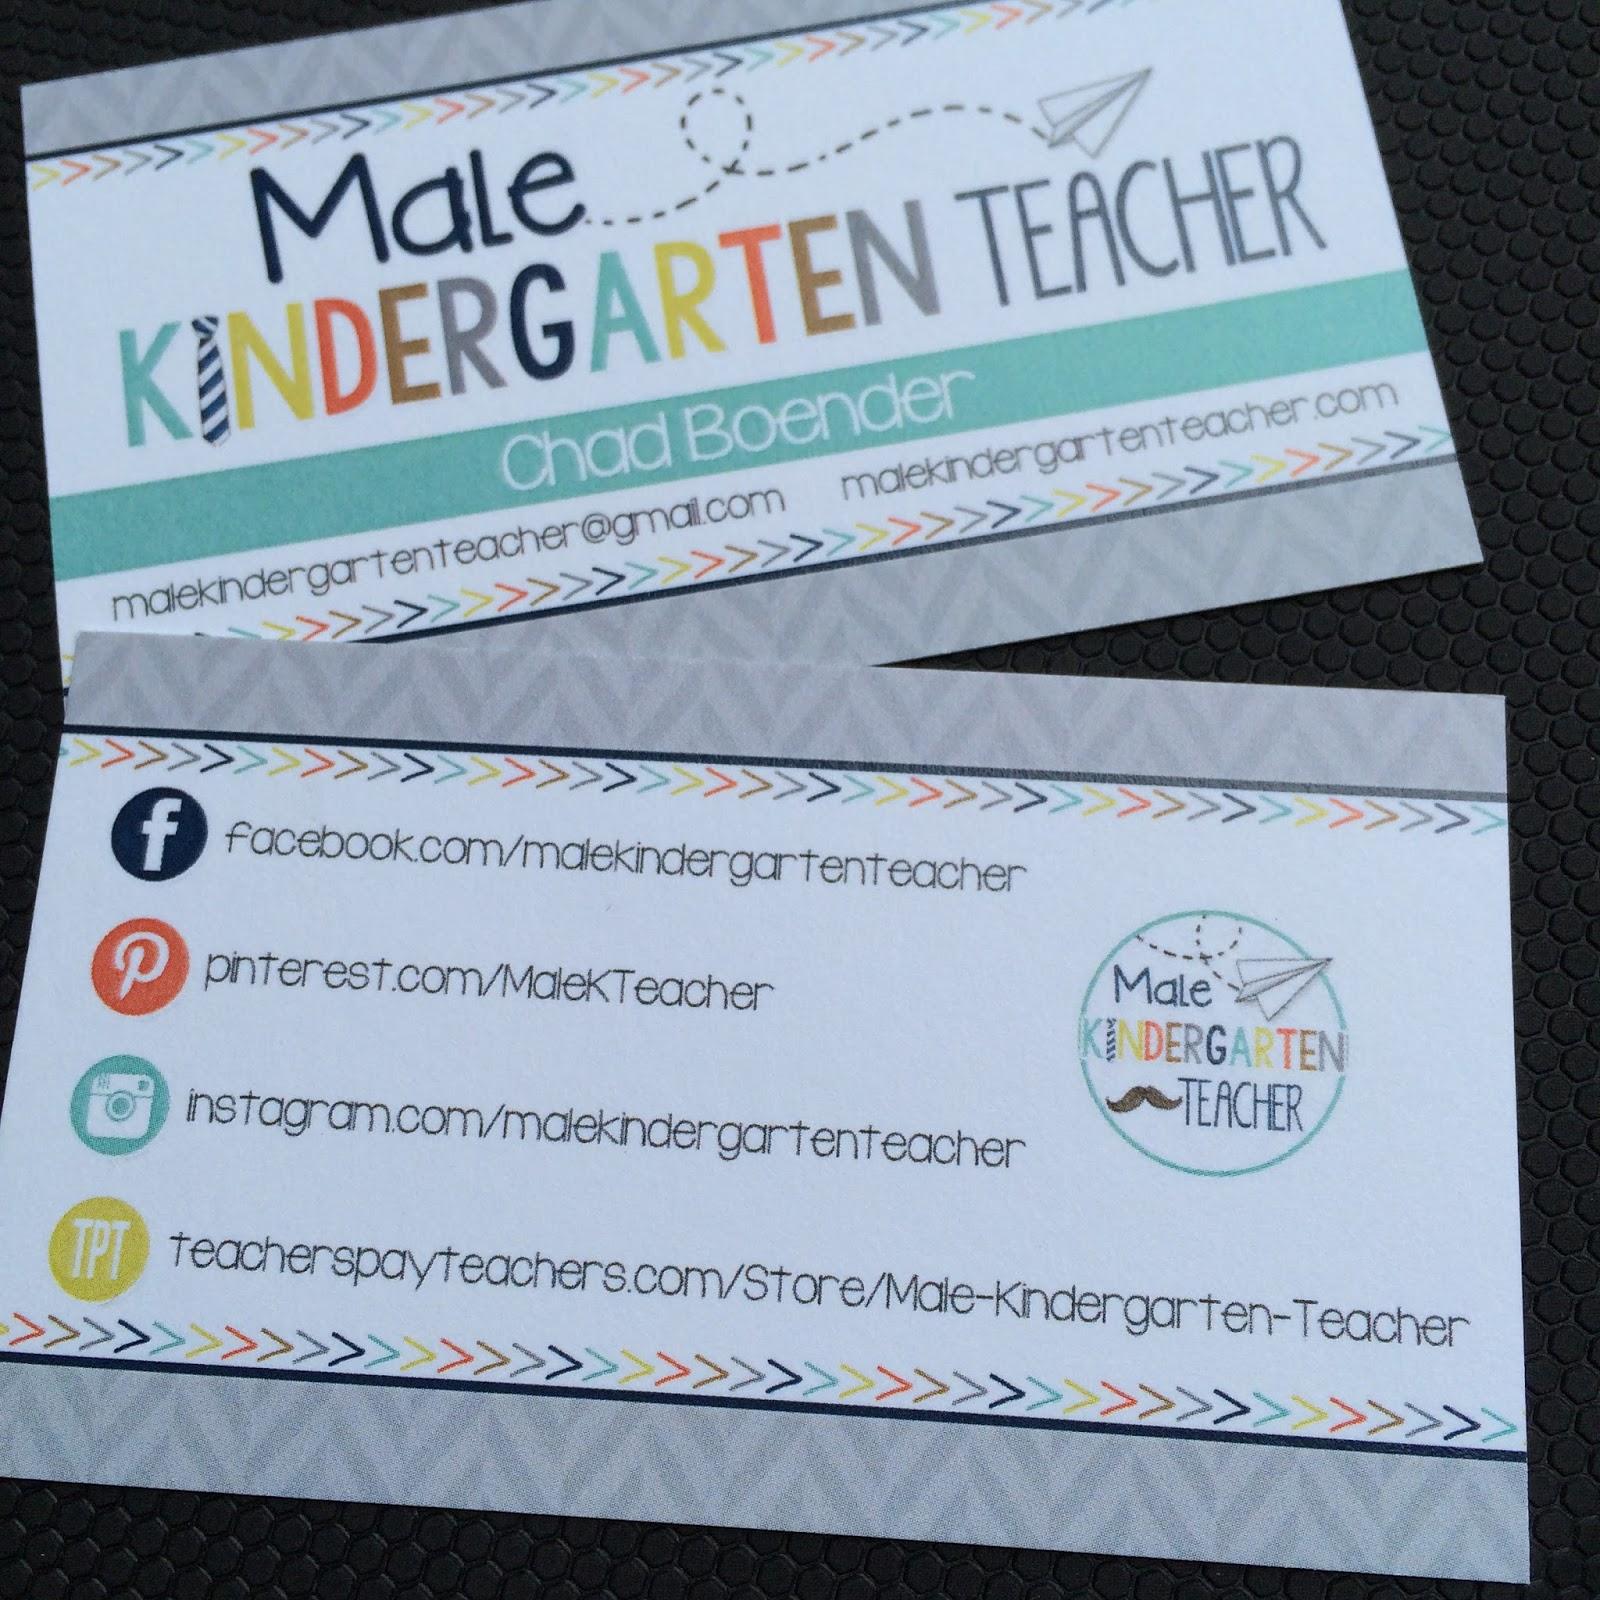 Teachers Pay Teachers Conference – Male Kindergarten Teacher